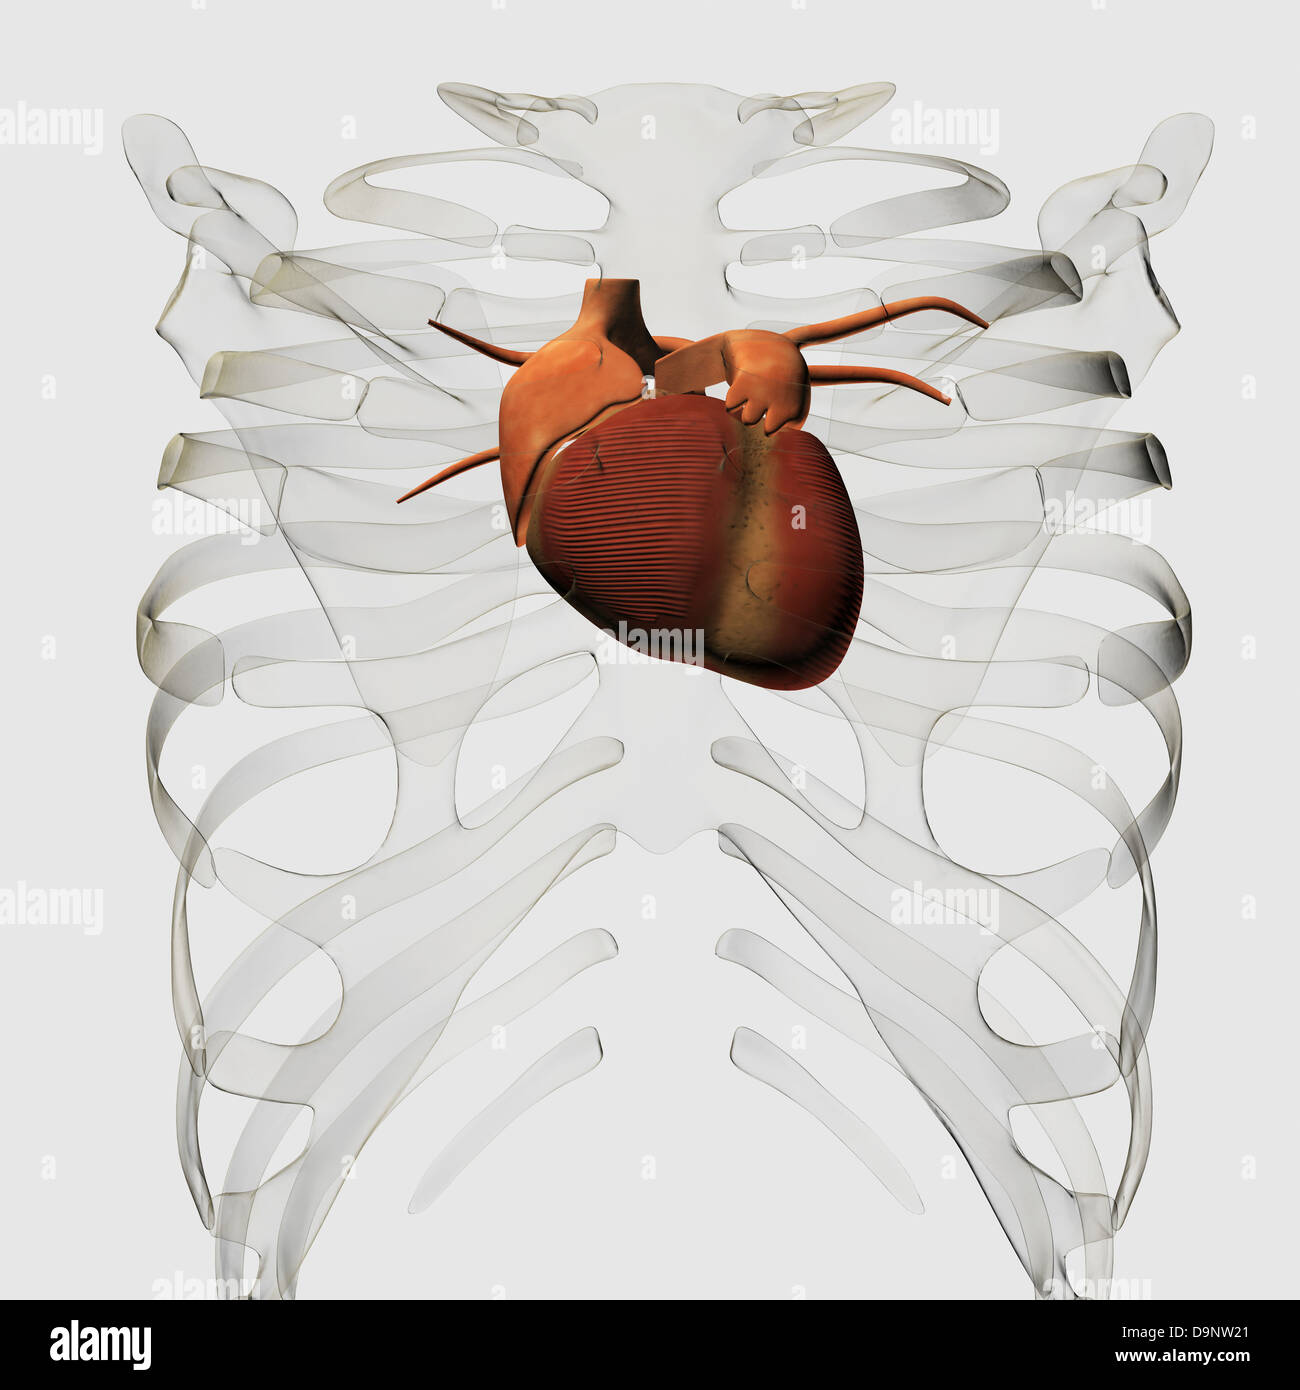 Medical Illustration Of Human Heart And Rib Cage Three Dimensional